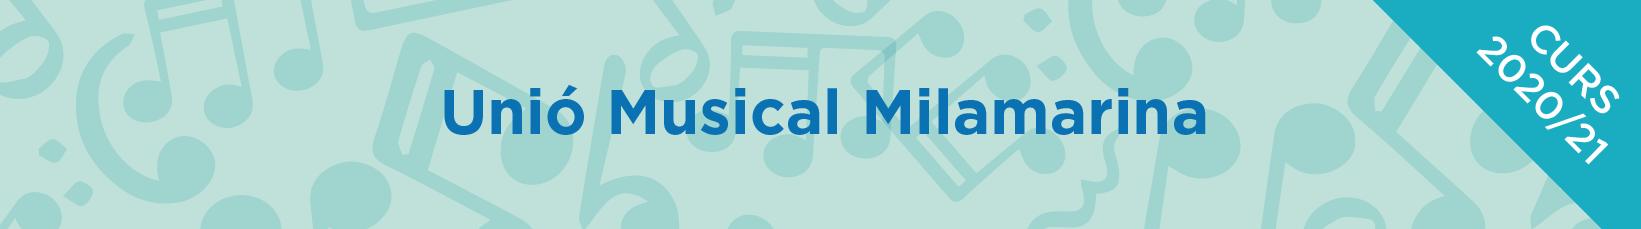 Unió Musical Milamarina - Descomptes matrícula